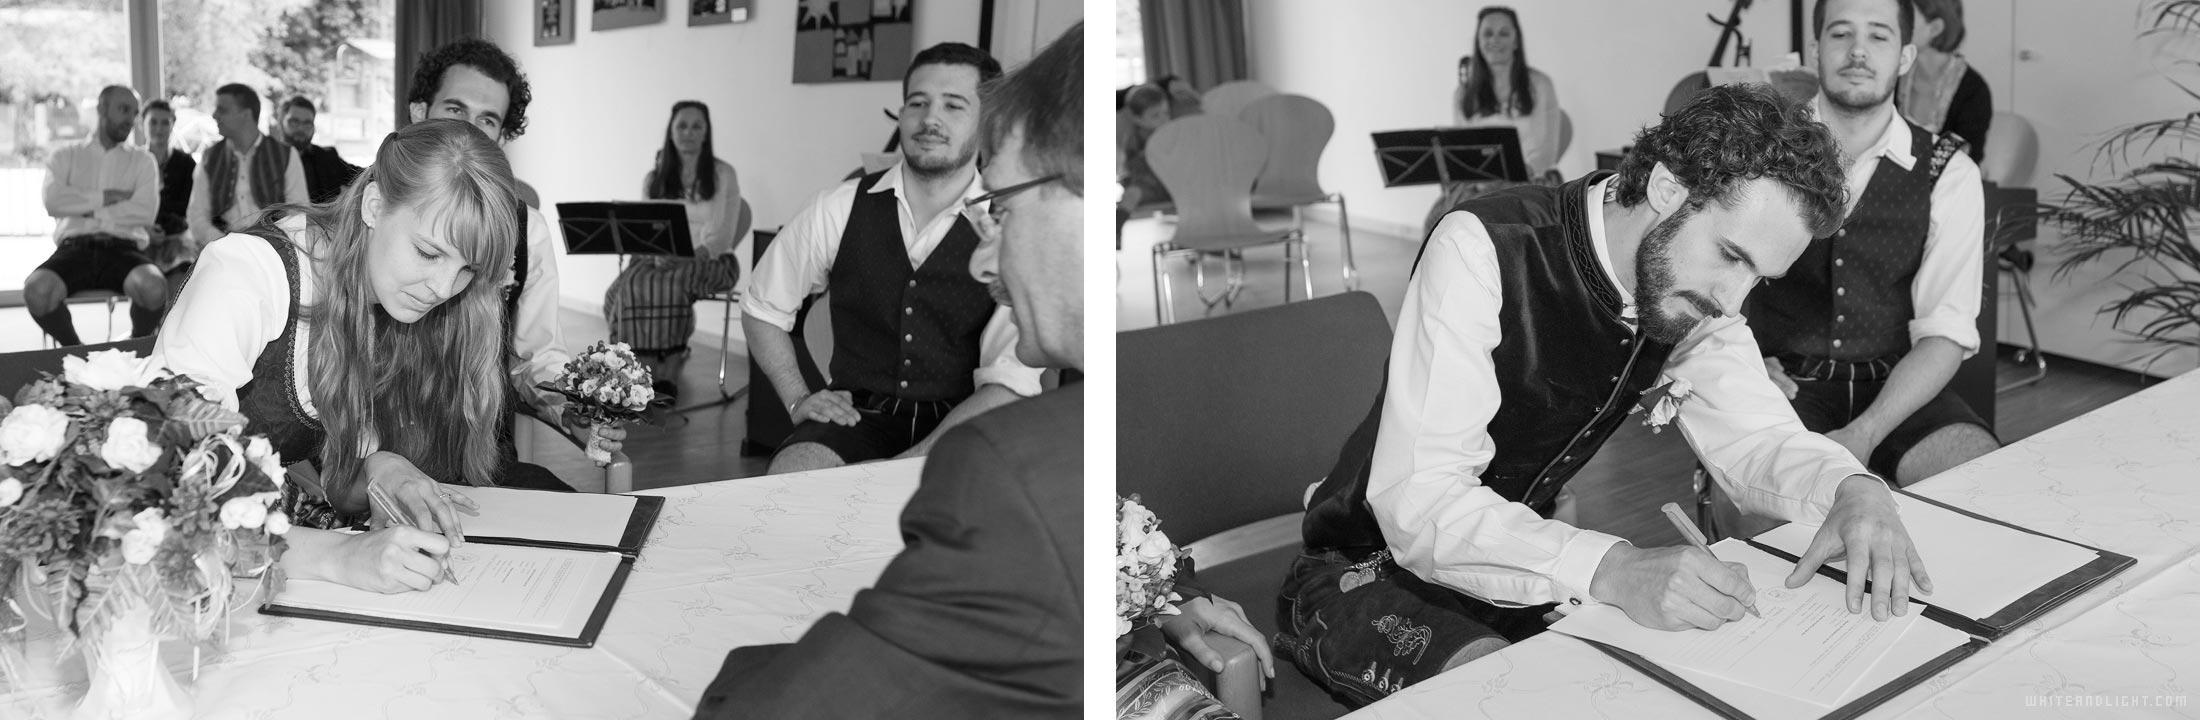 bavarian wedding customs